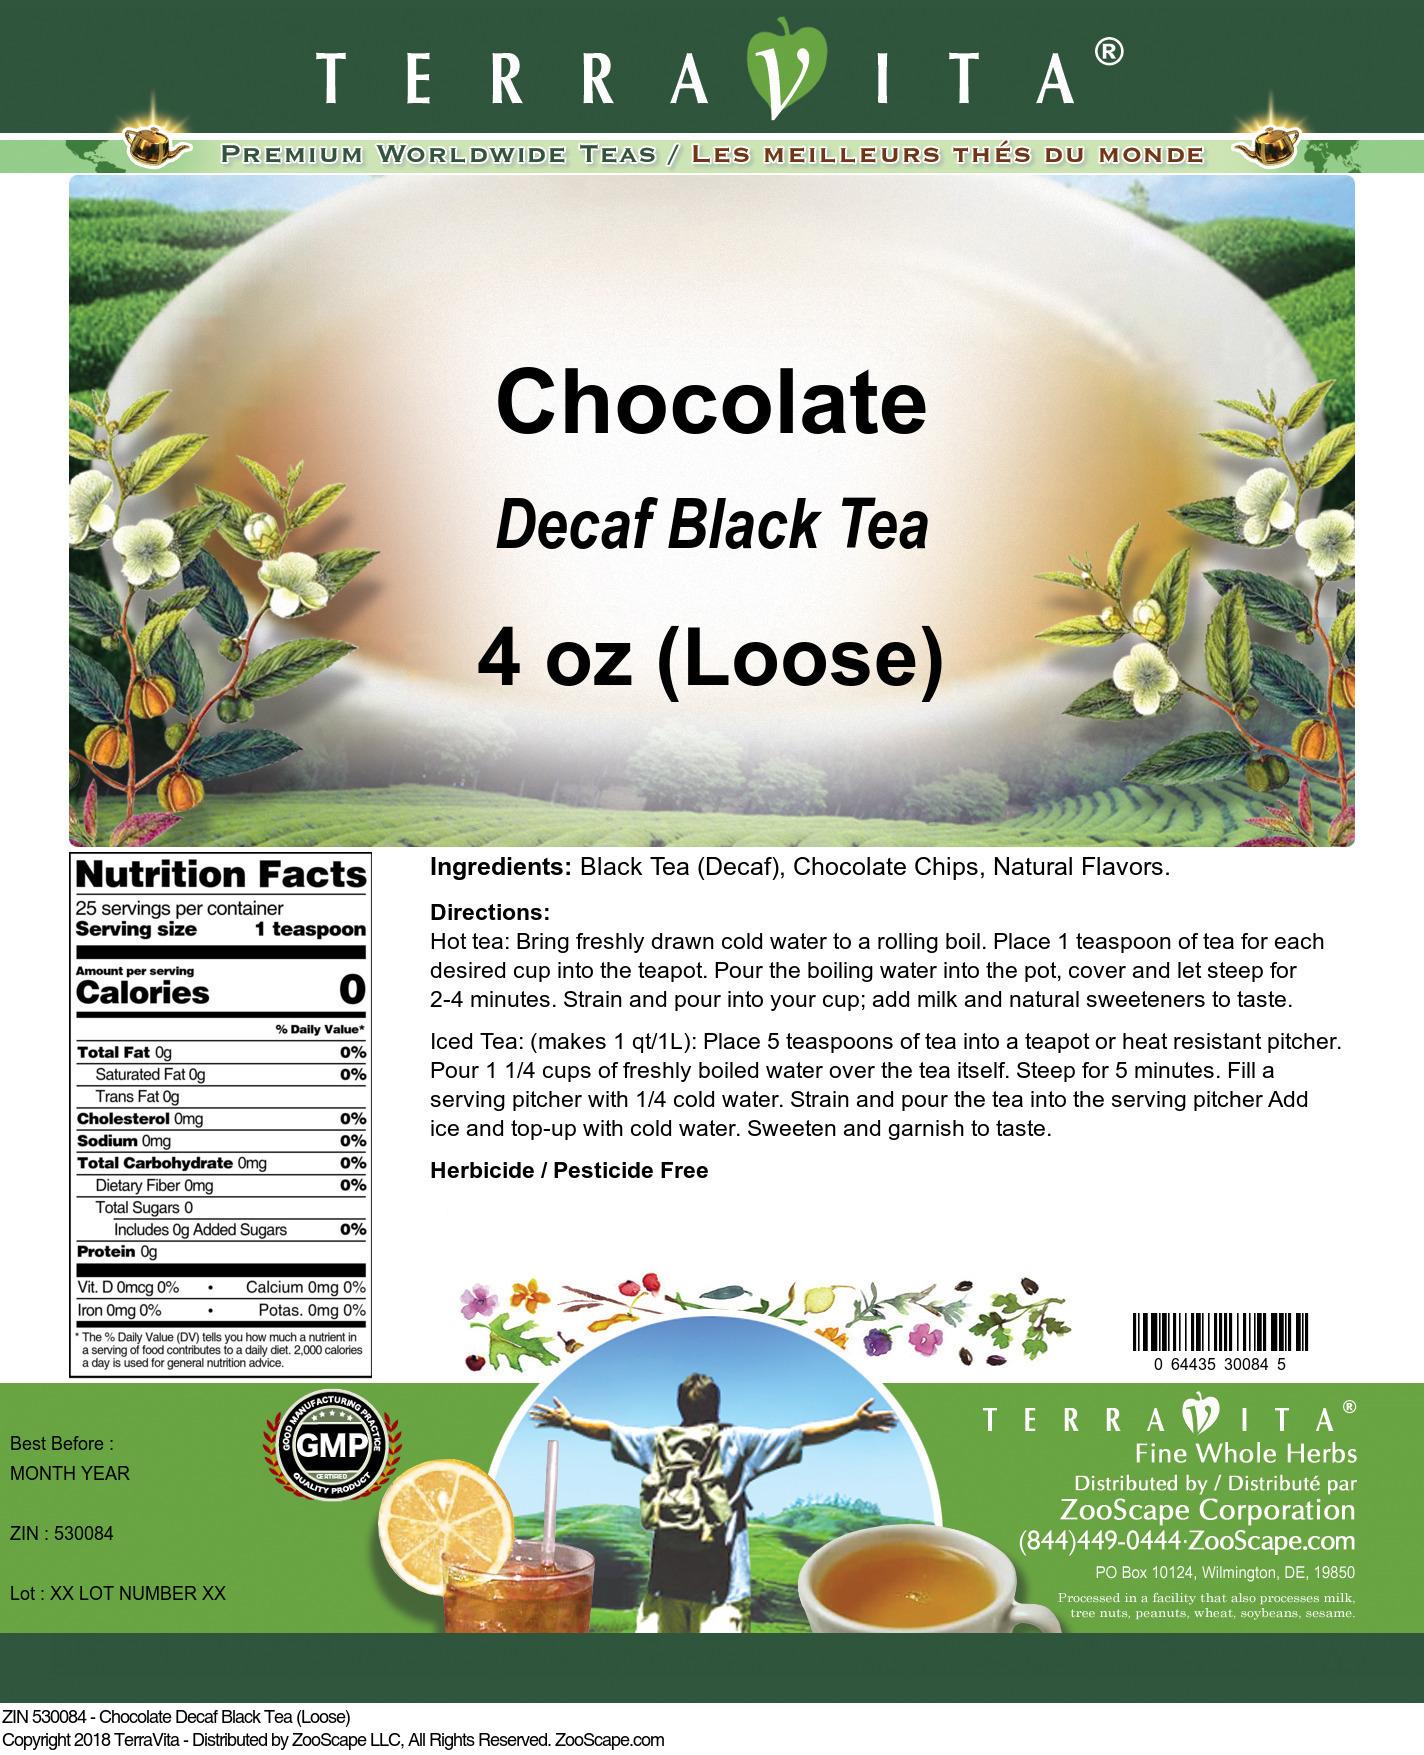 Chocolate Decaf Black Tea